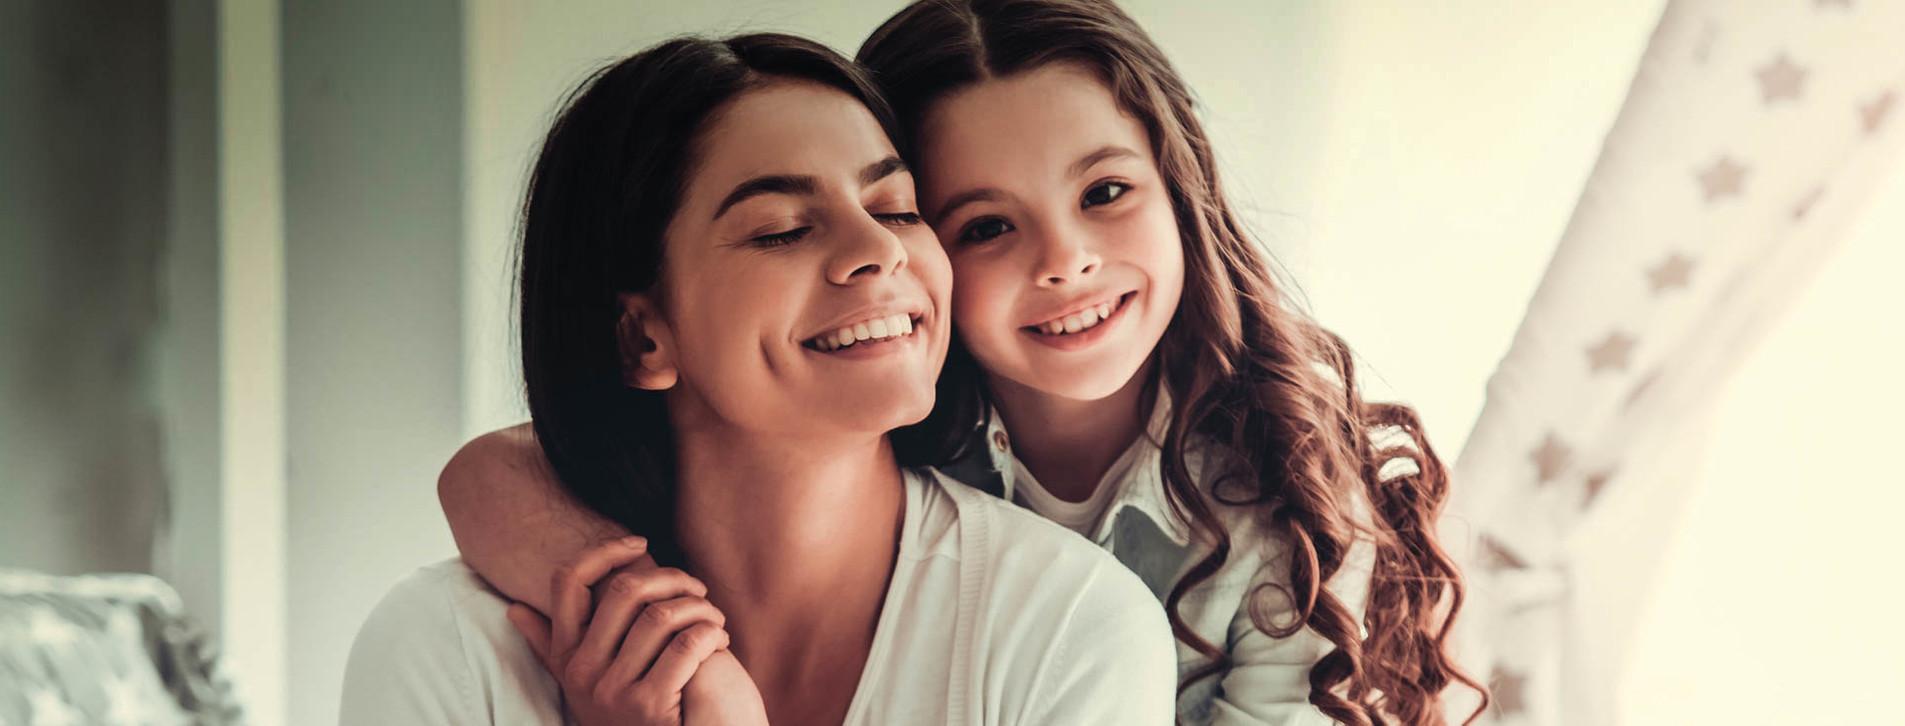 Фото - Beauty Day для мамы и дочки